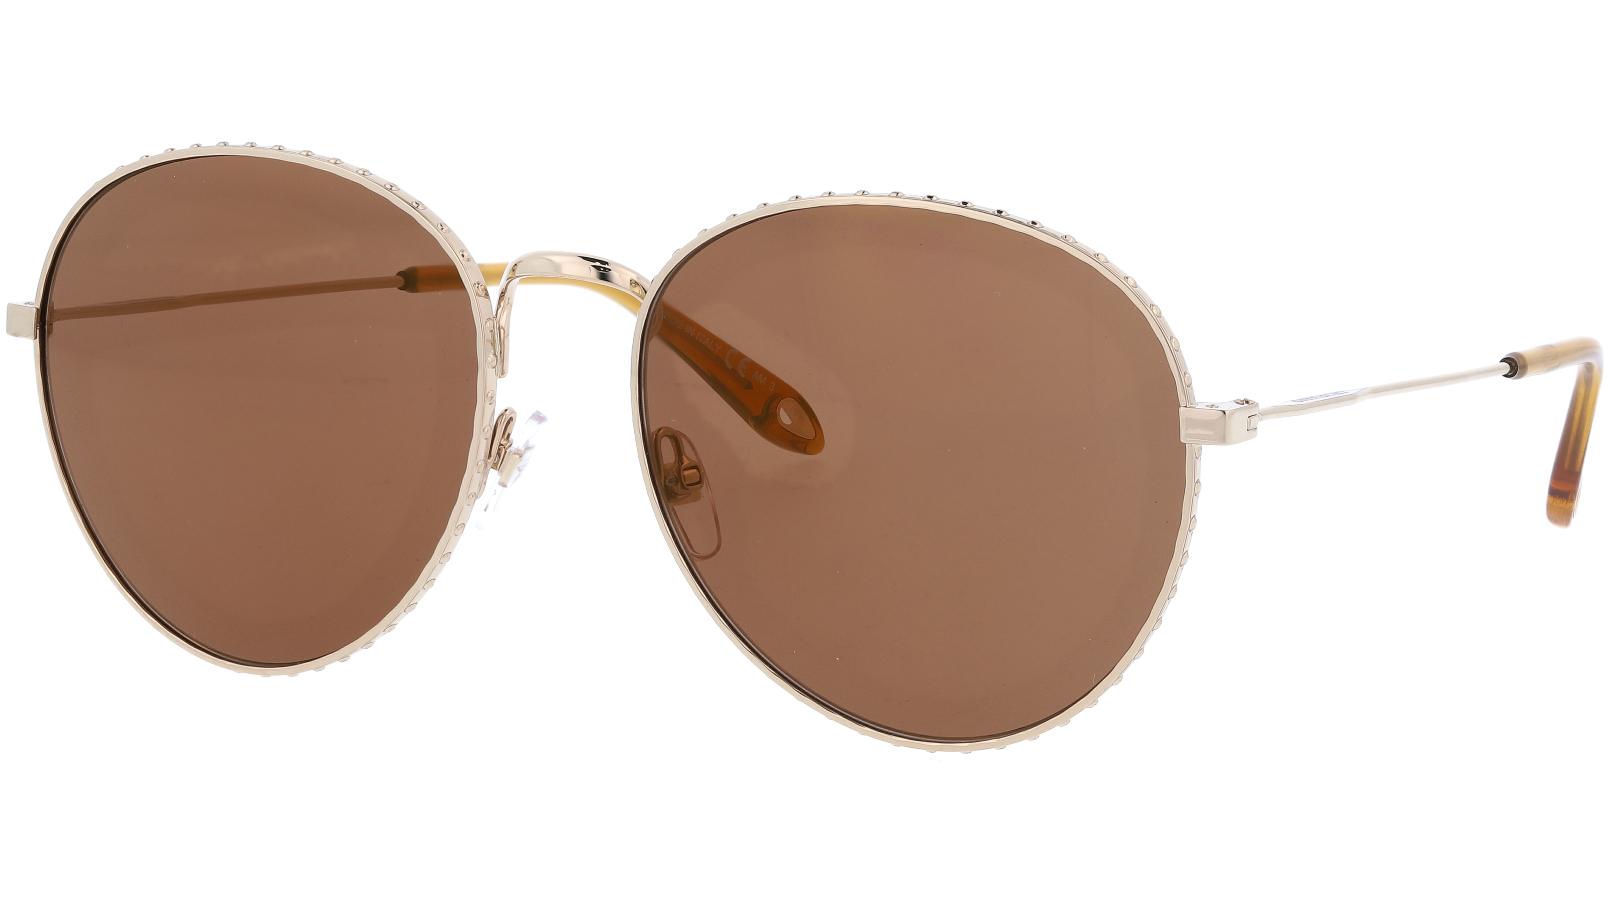 GIVENCHY GV7089S EYR13 60 GOLD Sunglasses